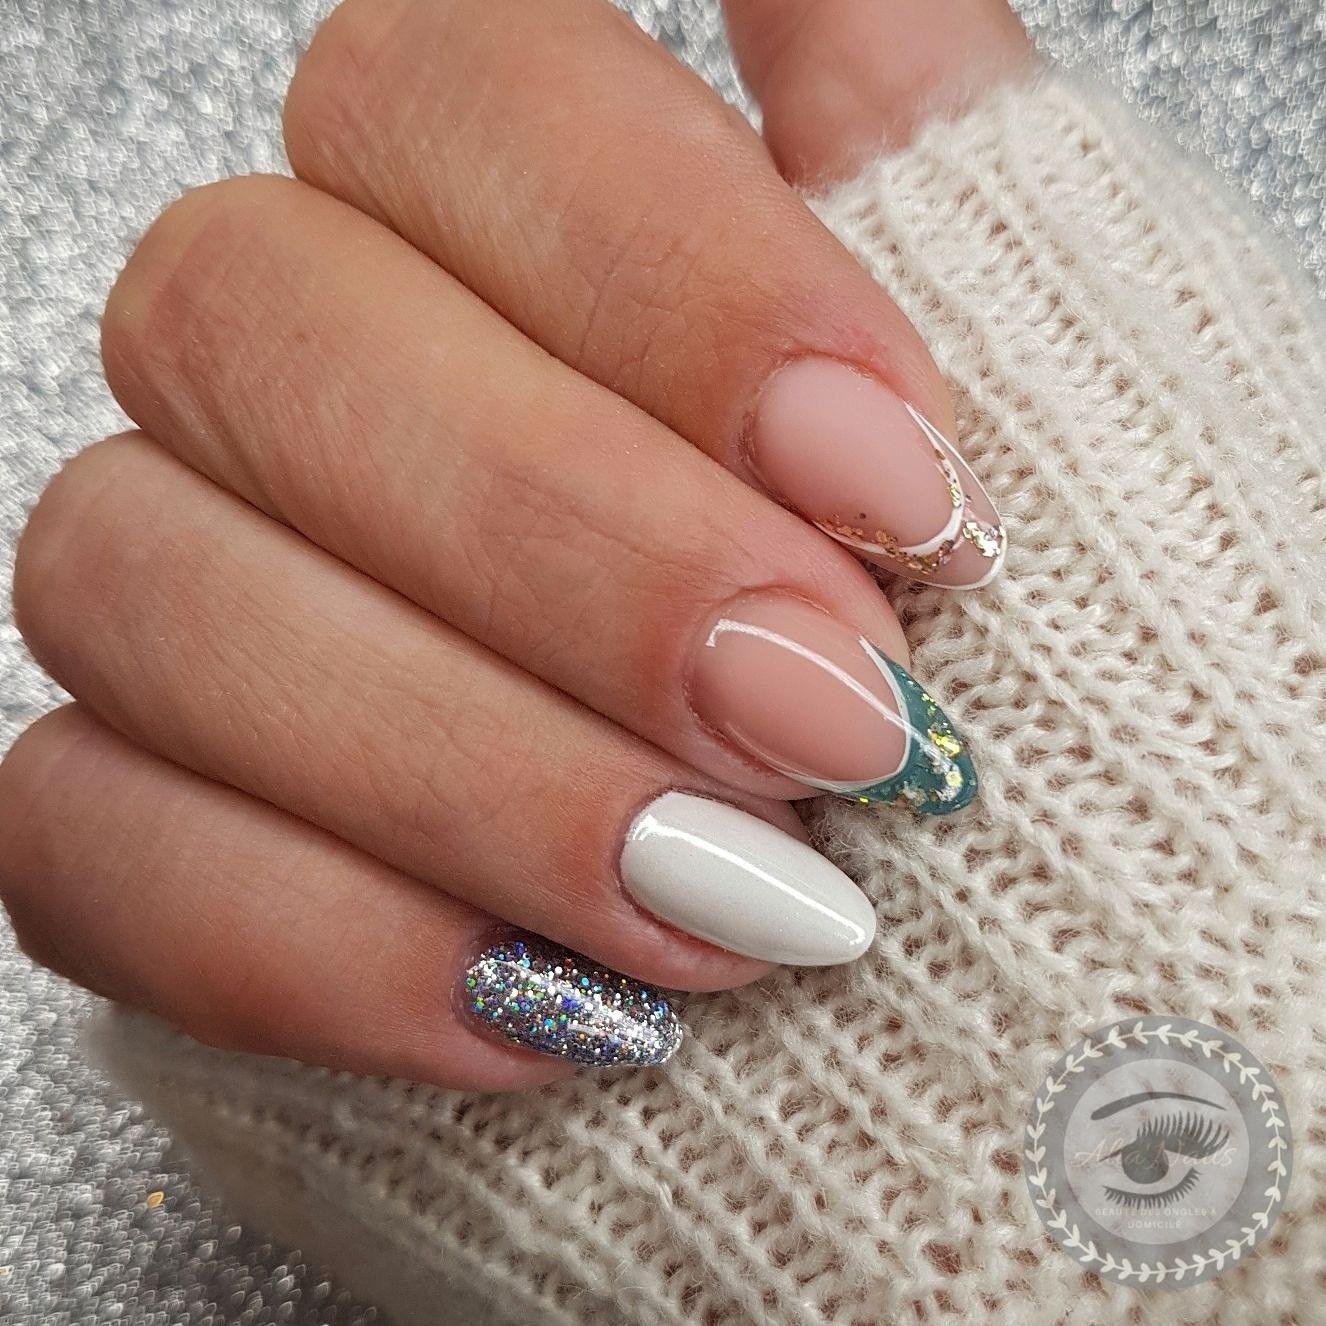 #onglesgel #onglesbordeaux #ongleslareole #onglesmarmande #semipermanent #manucure #fashionnails #tendance #nailfie #nailsadict #bordeauxmaville #laréole #marmande #alia_nails #nude #nudenails